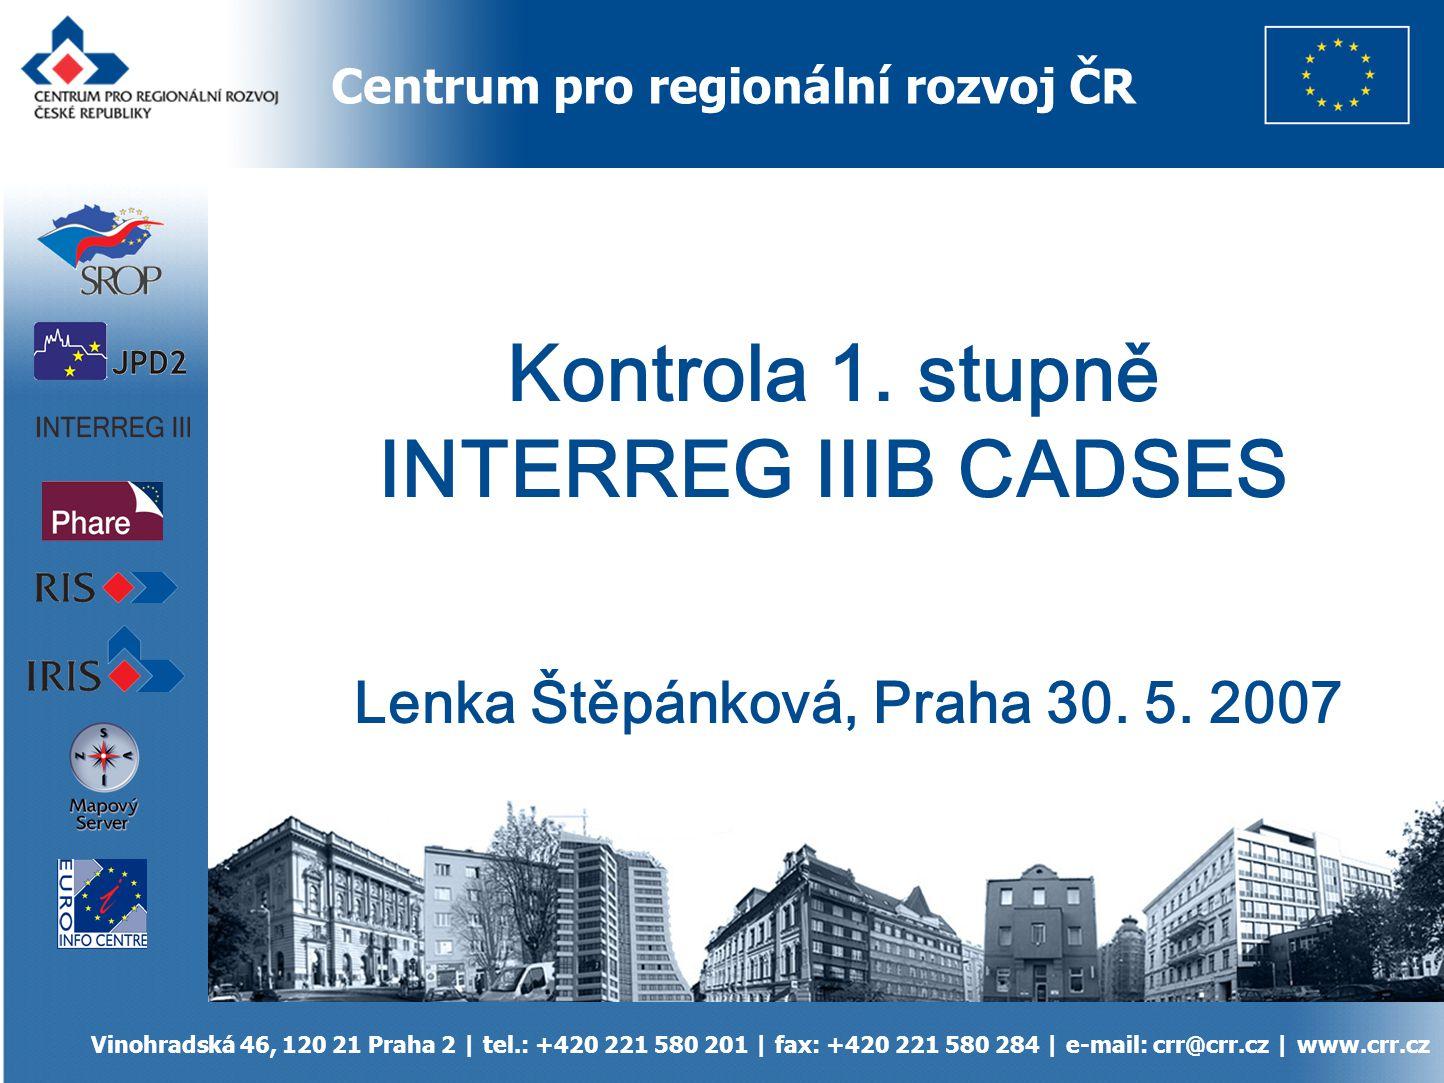 Centrum pro regionální rozvoj ČR Vinohradská 46, 120 21 Praha 2 | tel.: +420 221 580 201 | fax: +420 221 580 284 | e-mail: crr@crr.cz | www.crr.cz Kontrola 1.